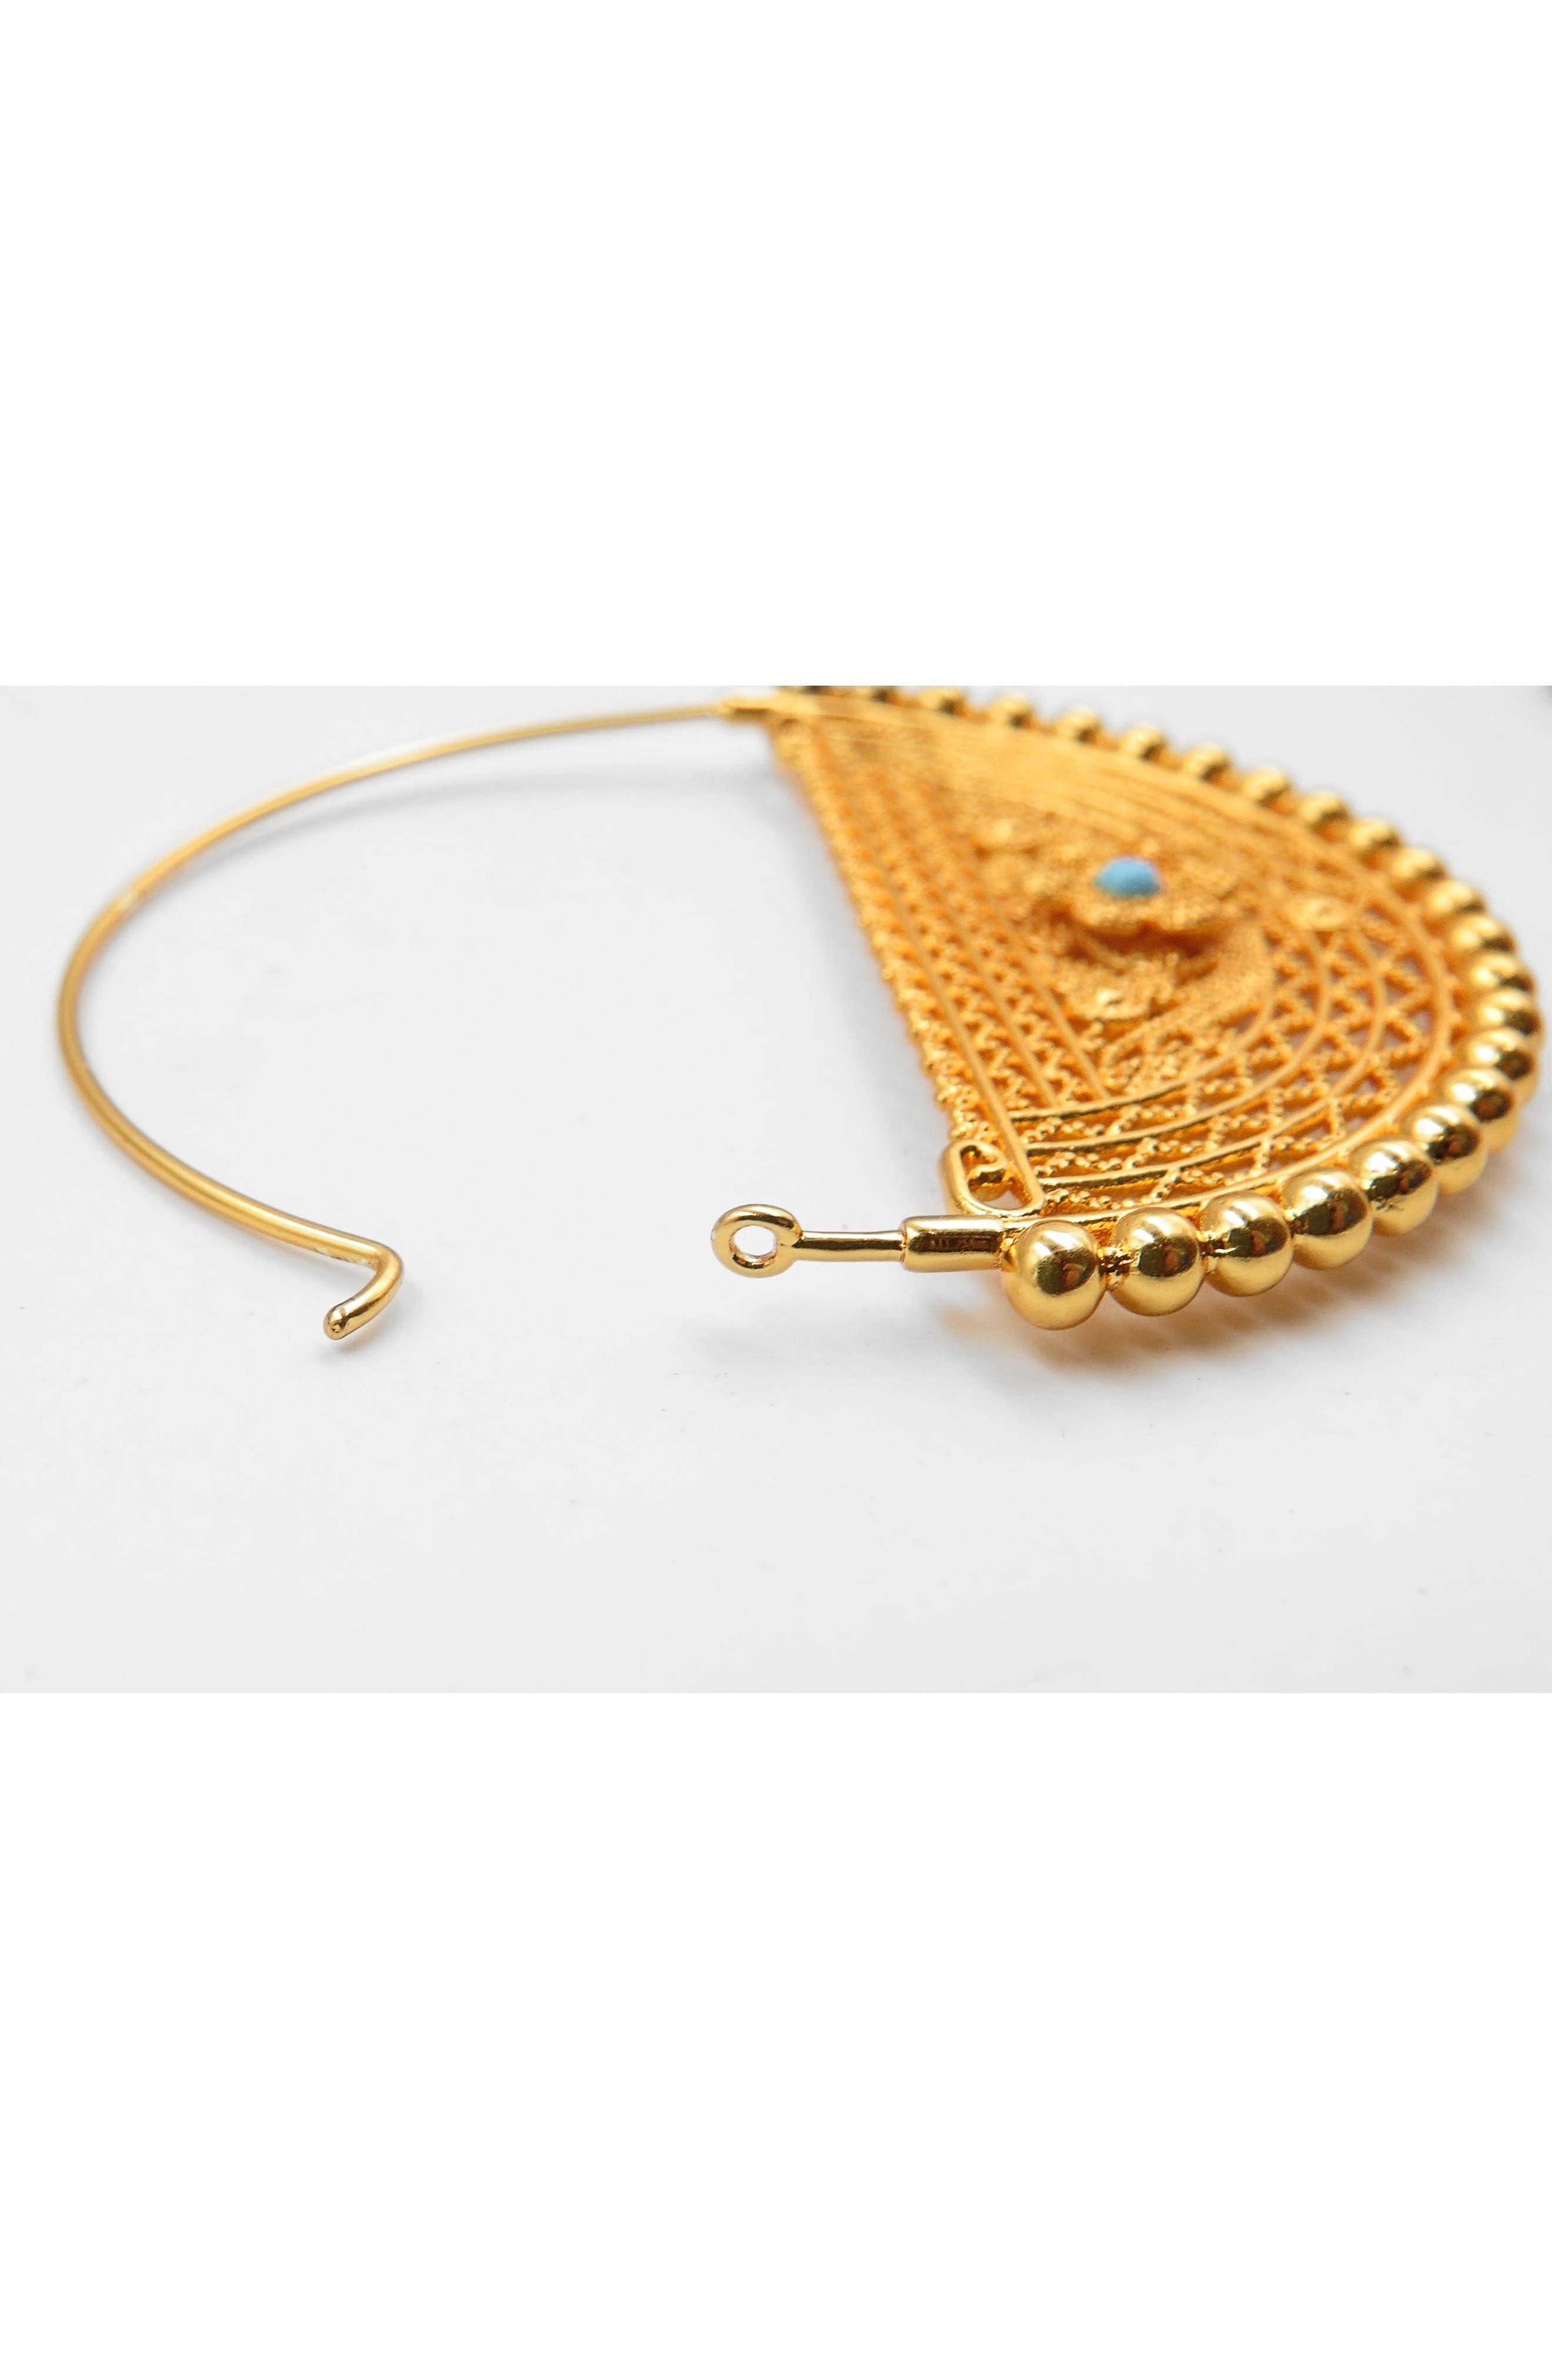 Filigree Hoop Earrings,                             Alternate thumbnail 3, color,                             Gold